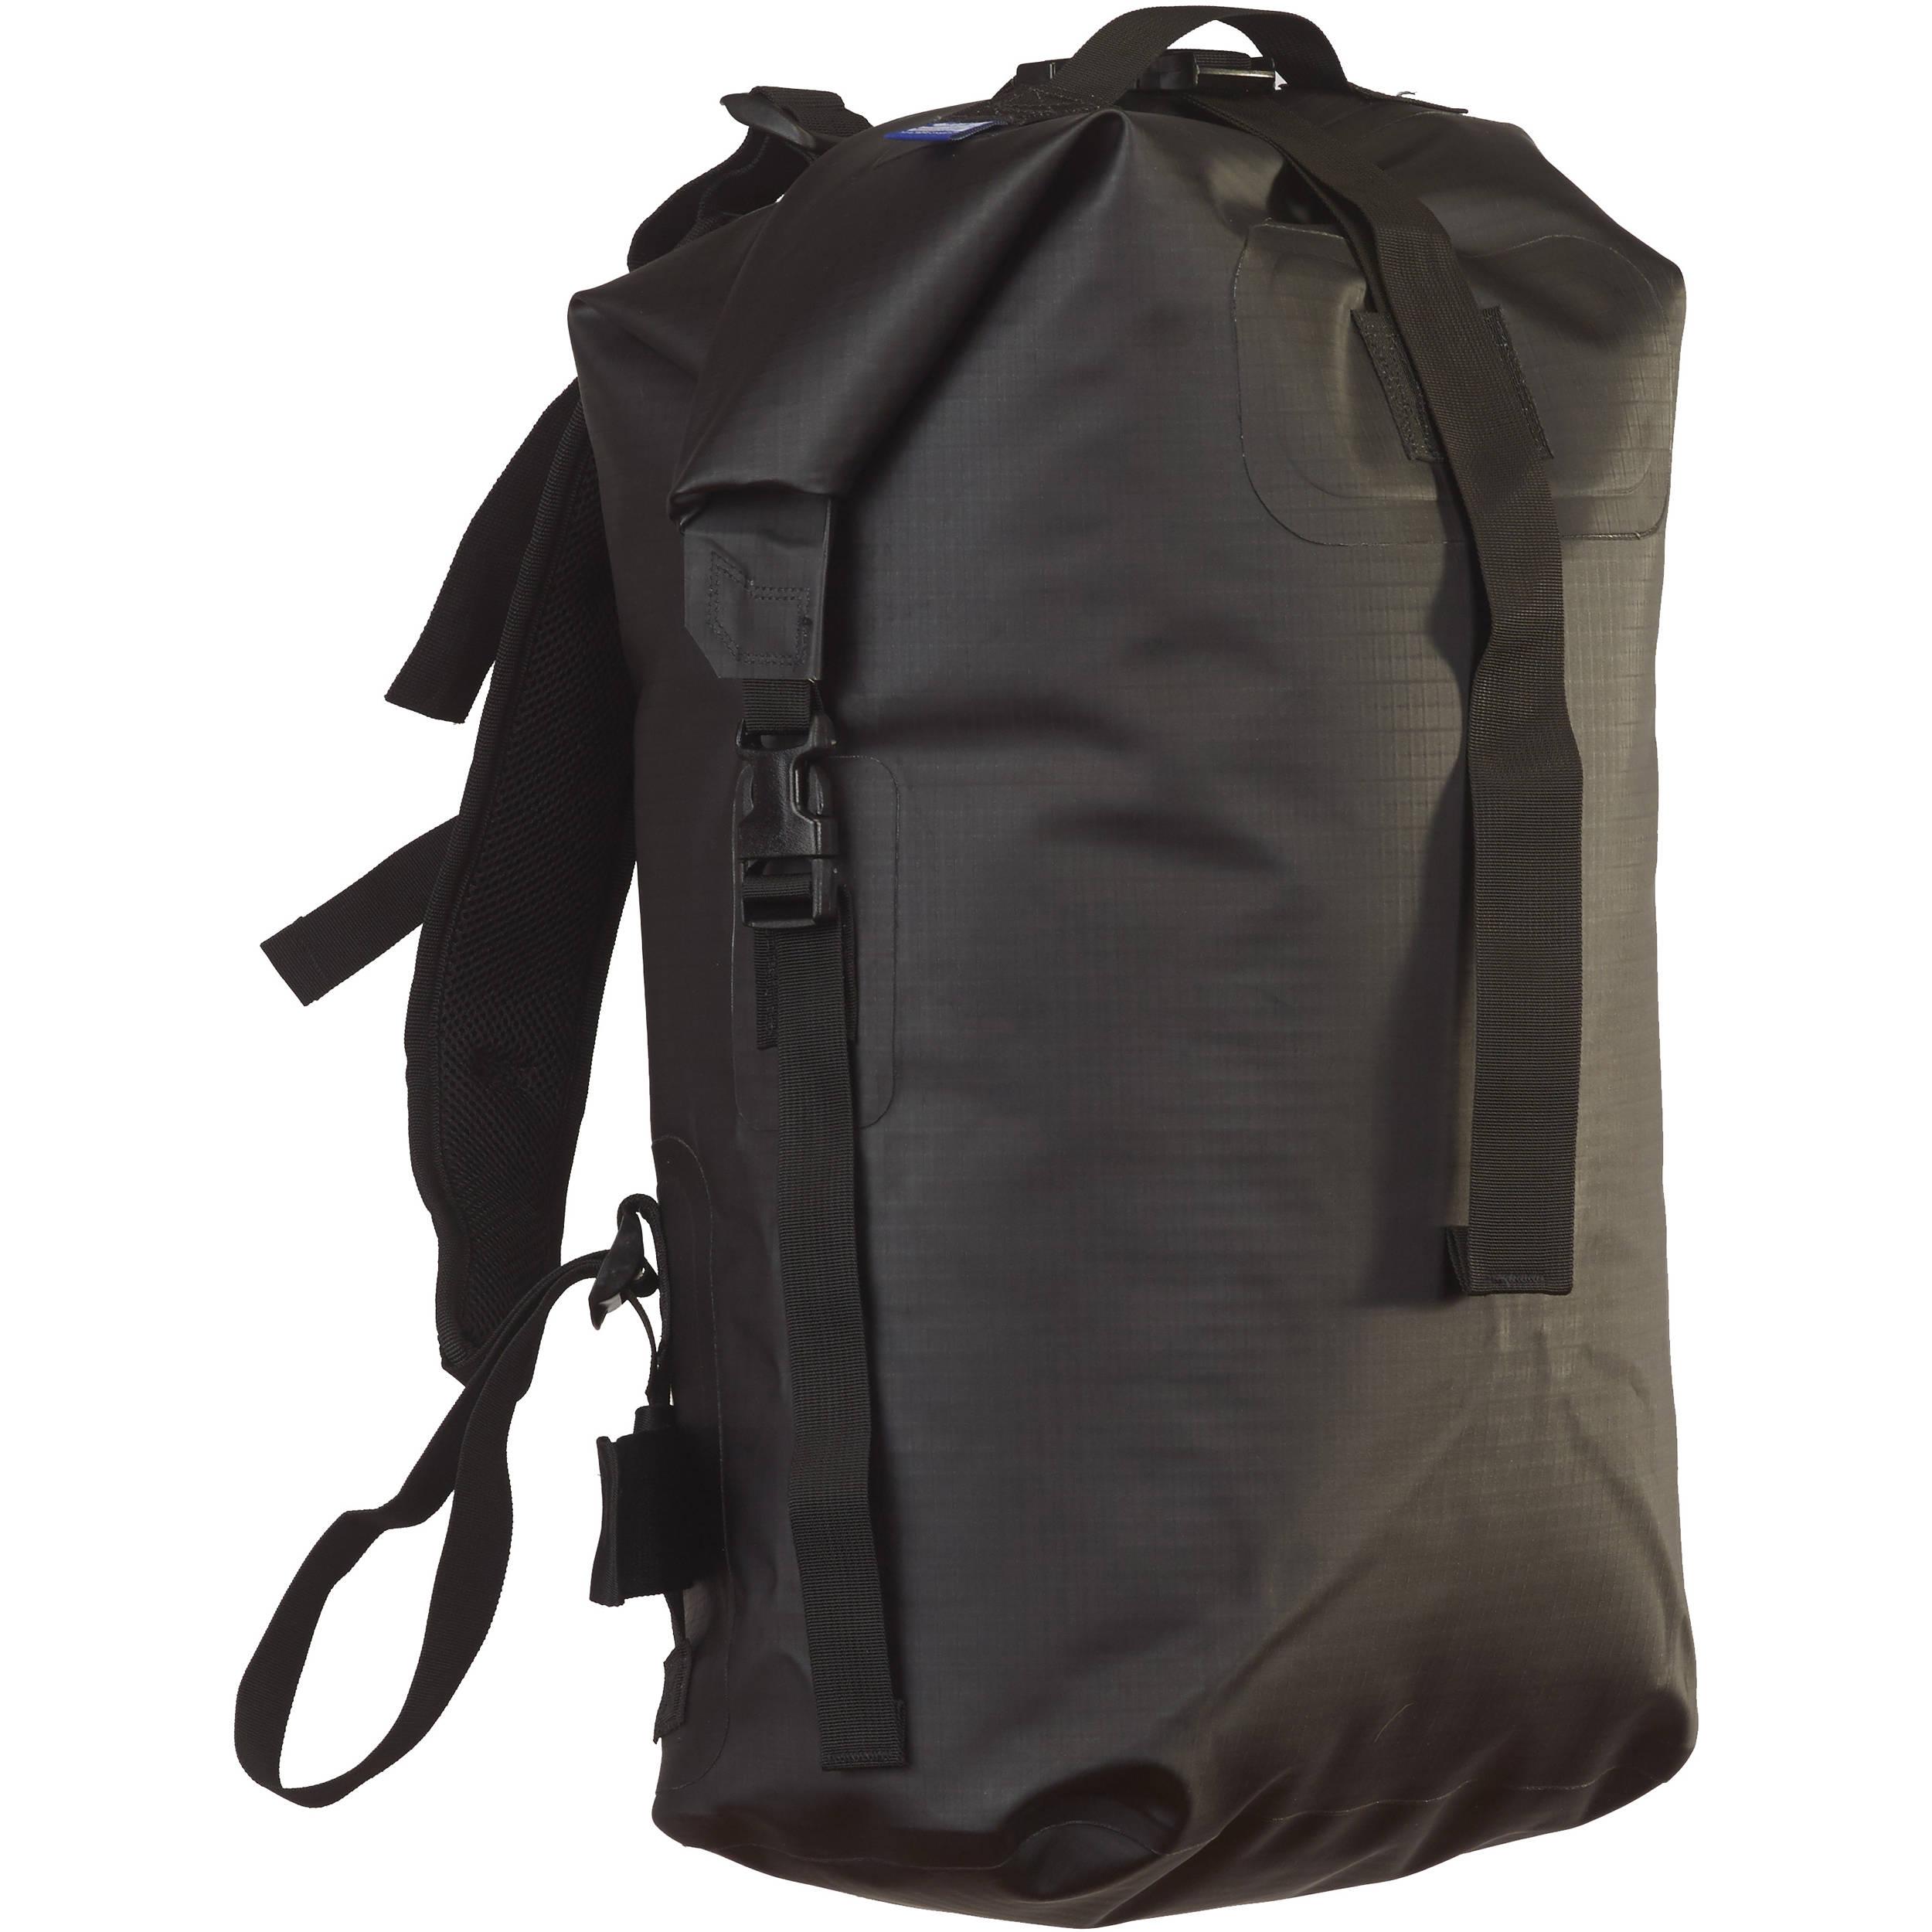 WATERSHED Animas Backpack (Black) FGW-ANI-BLK B H Photo Video cbb4eeb927ecf